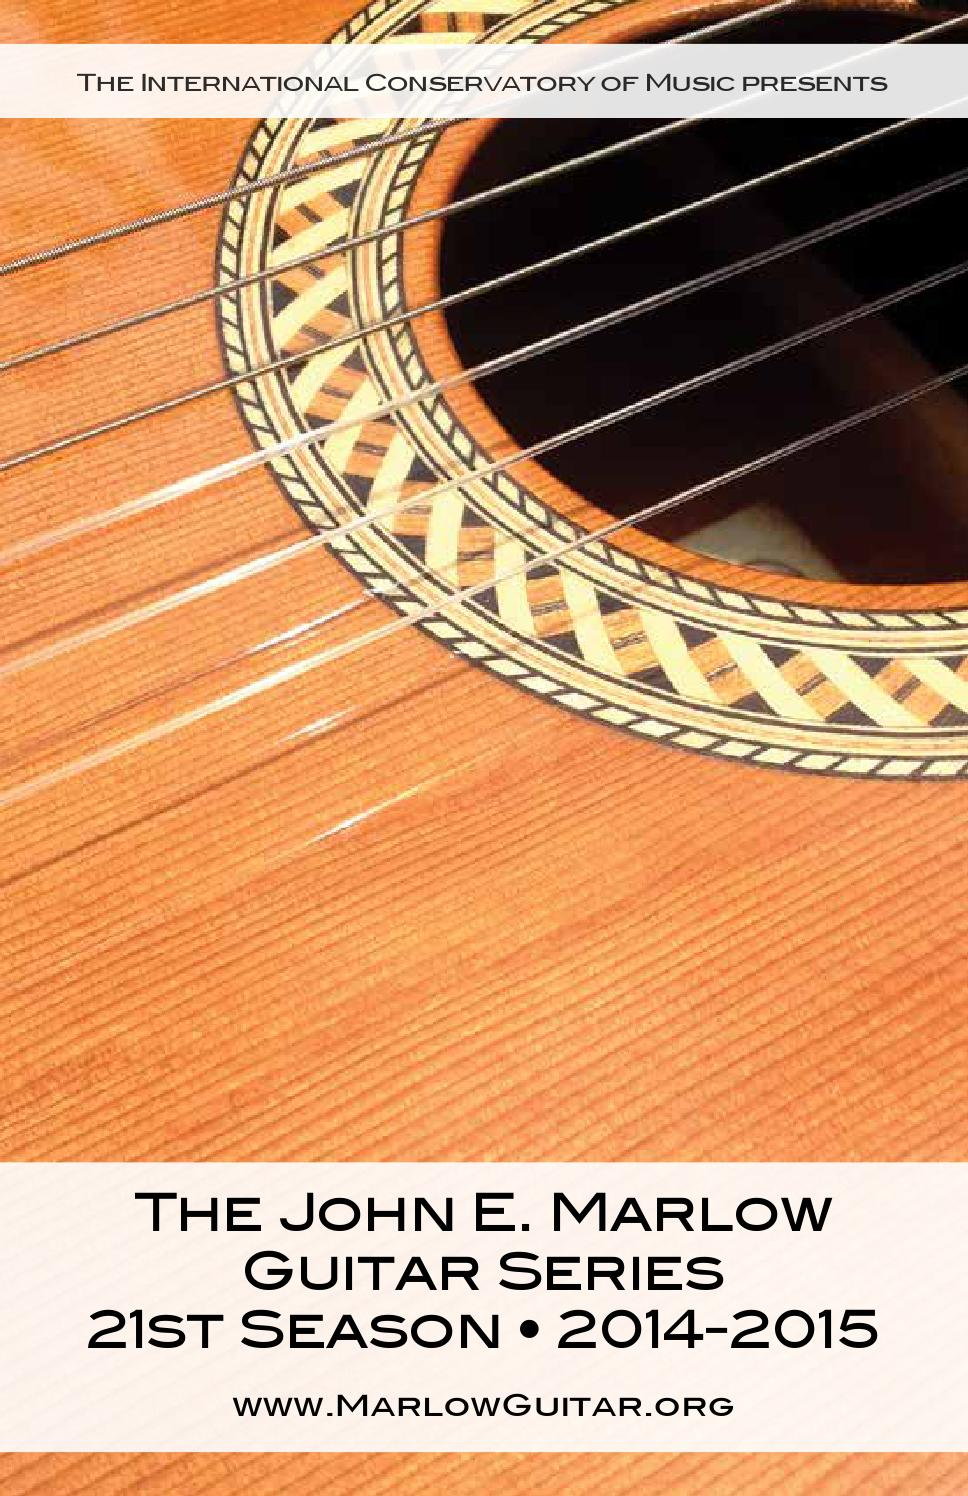 The John E Marlow Guitar Series 2014 2015 21st Season By The